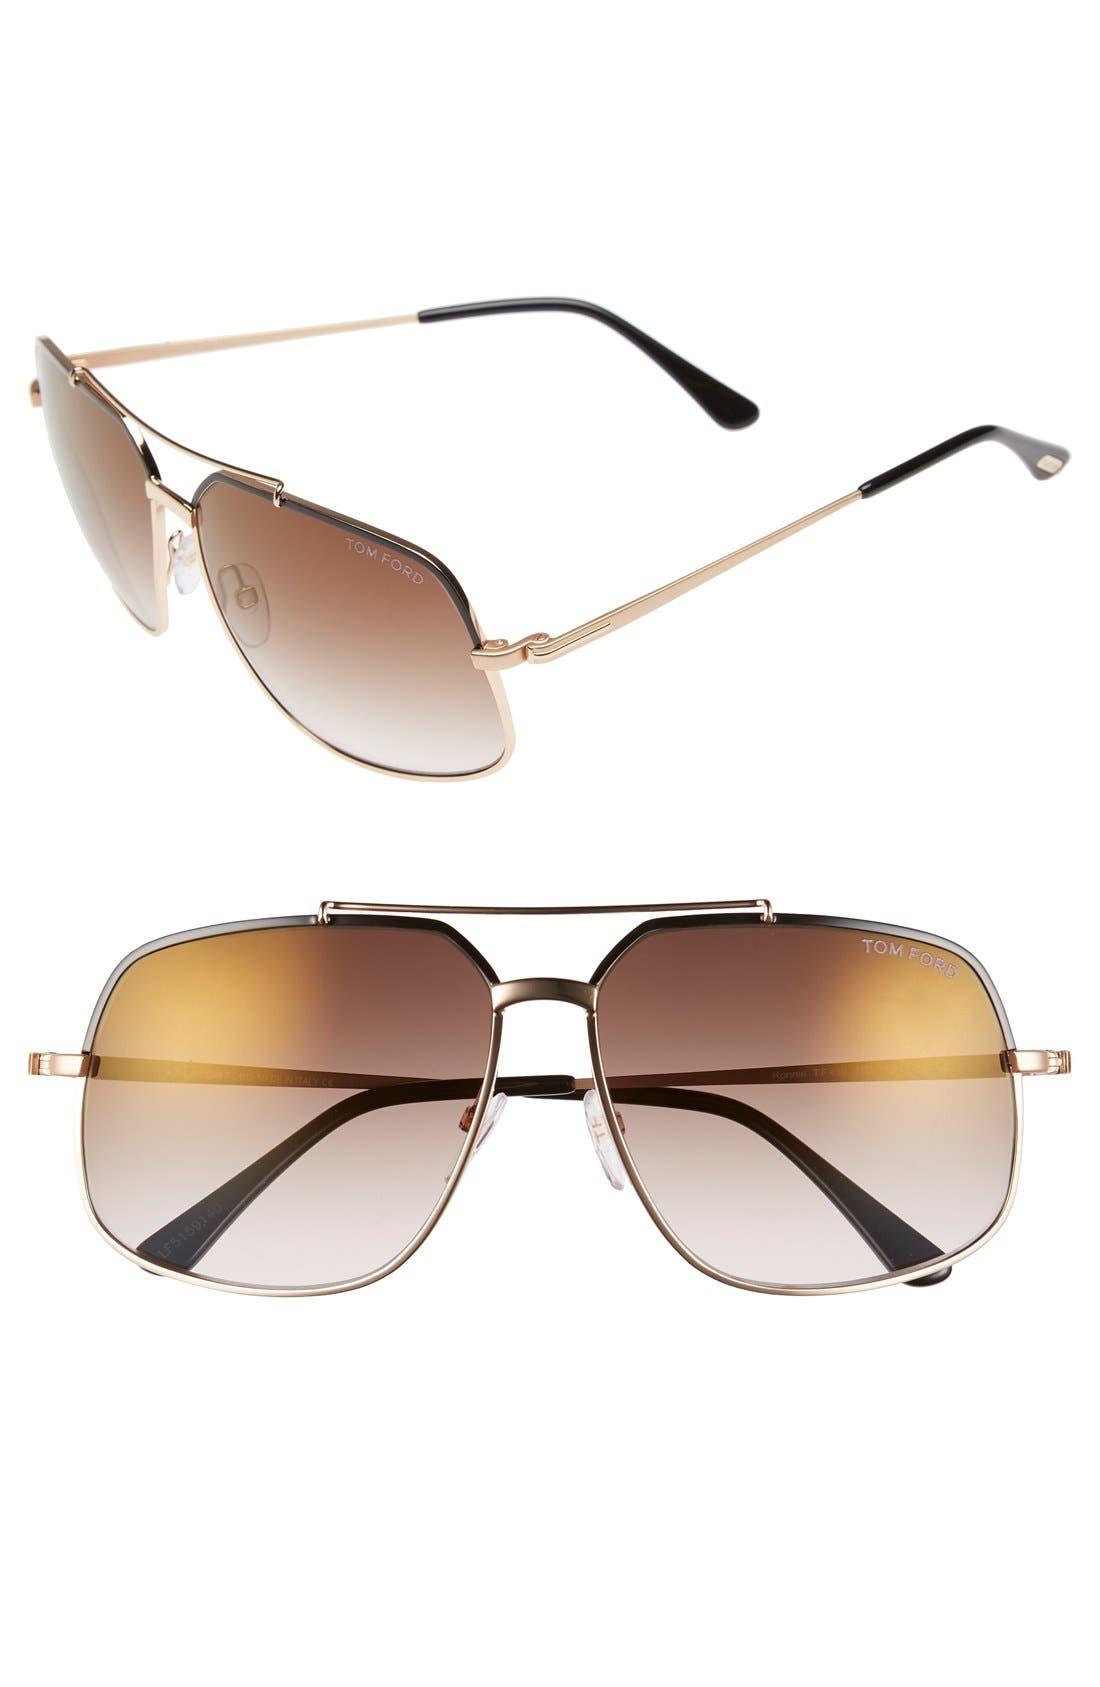 TOM FORD Ronnie 60mm Aviator Sunglasses